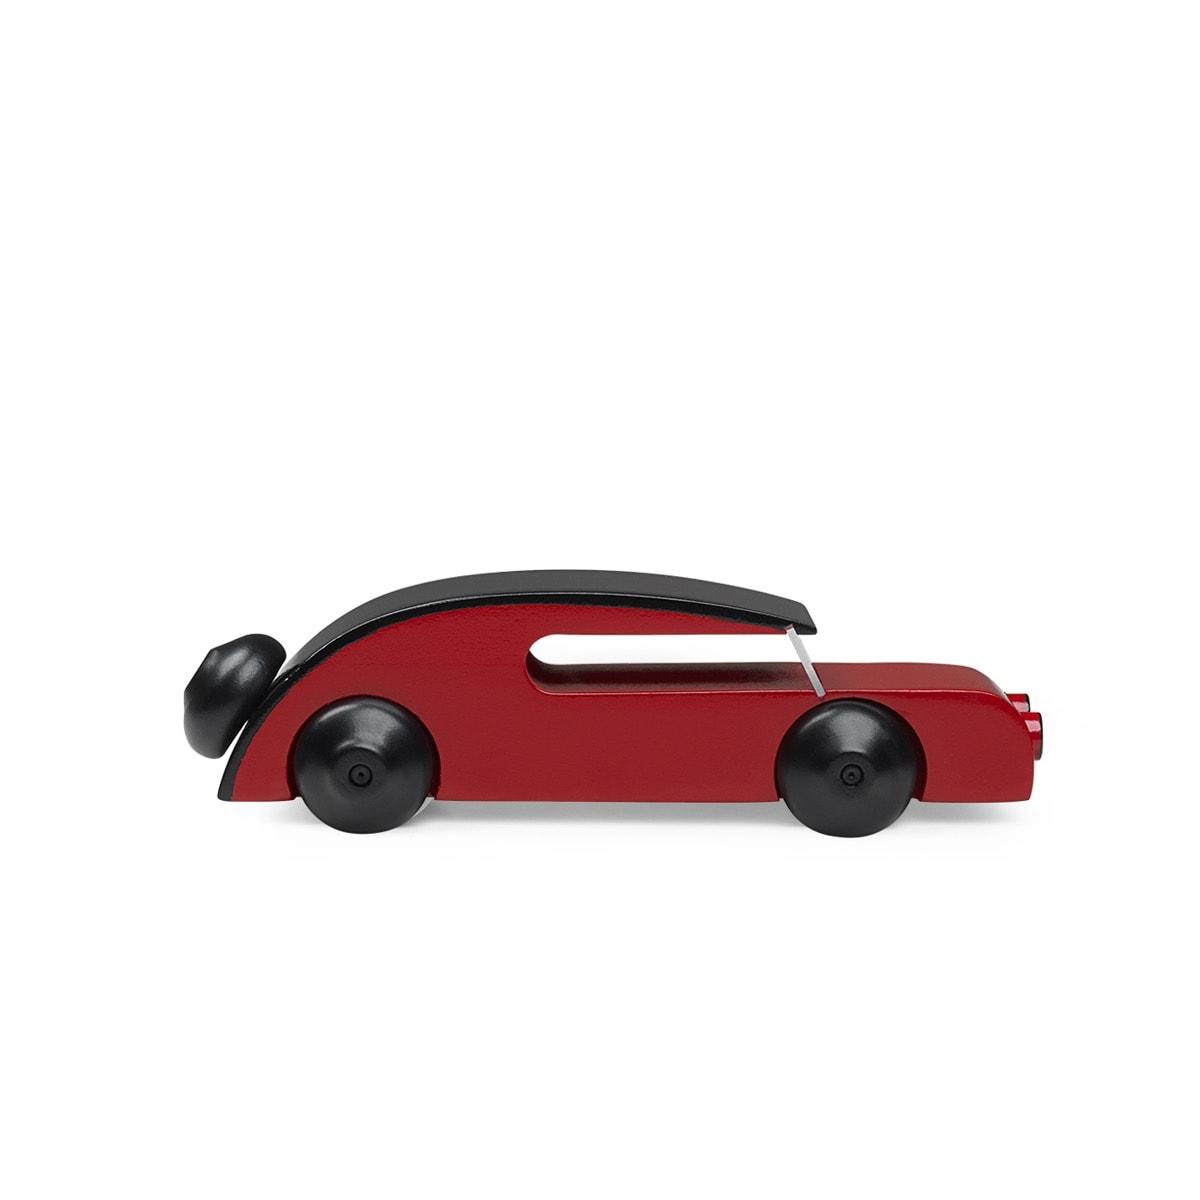 Automobil sedan röd